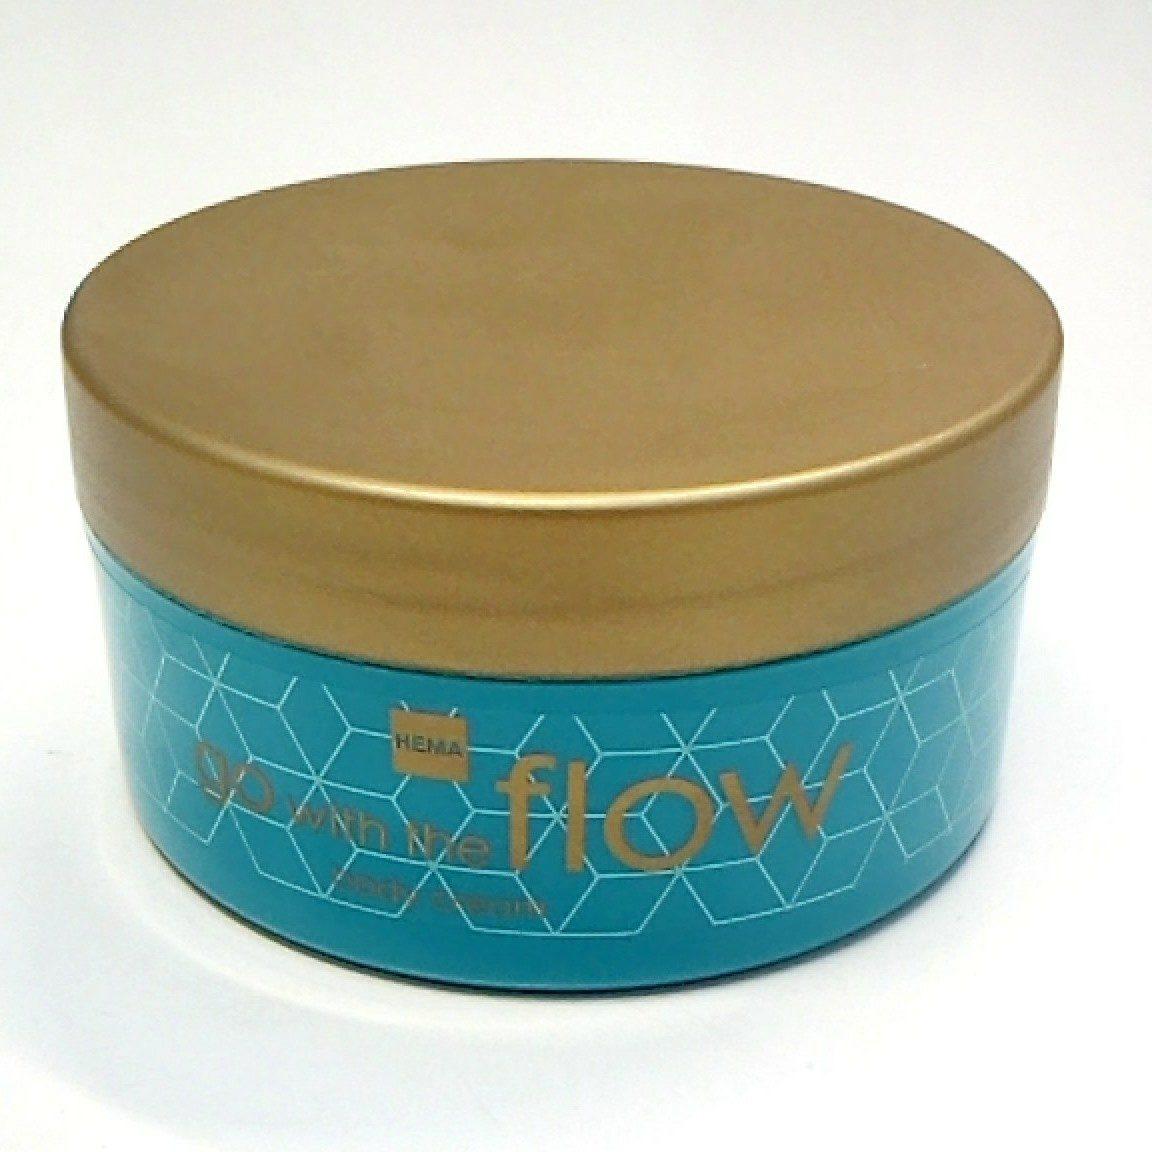 Go With The Flow Body Cream - Produit - fr